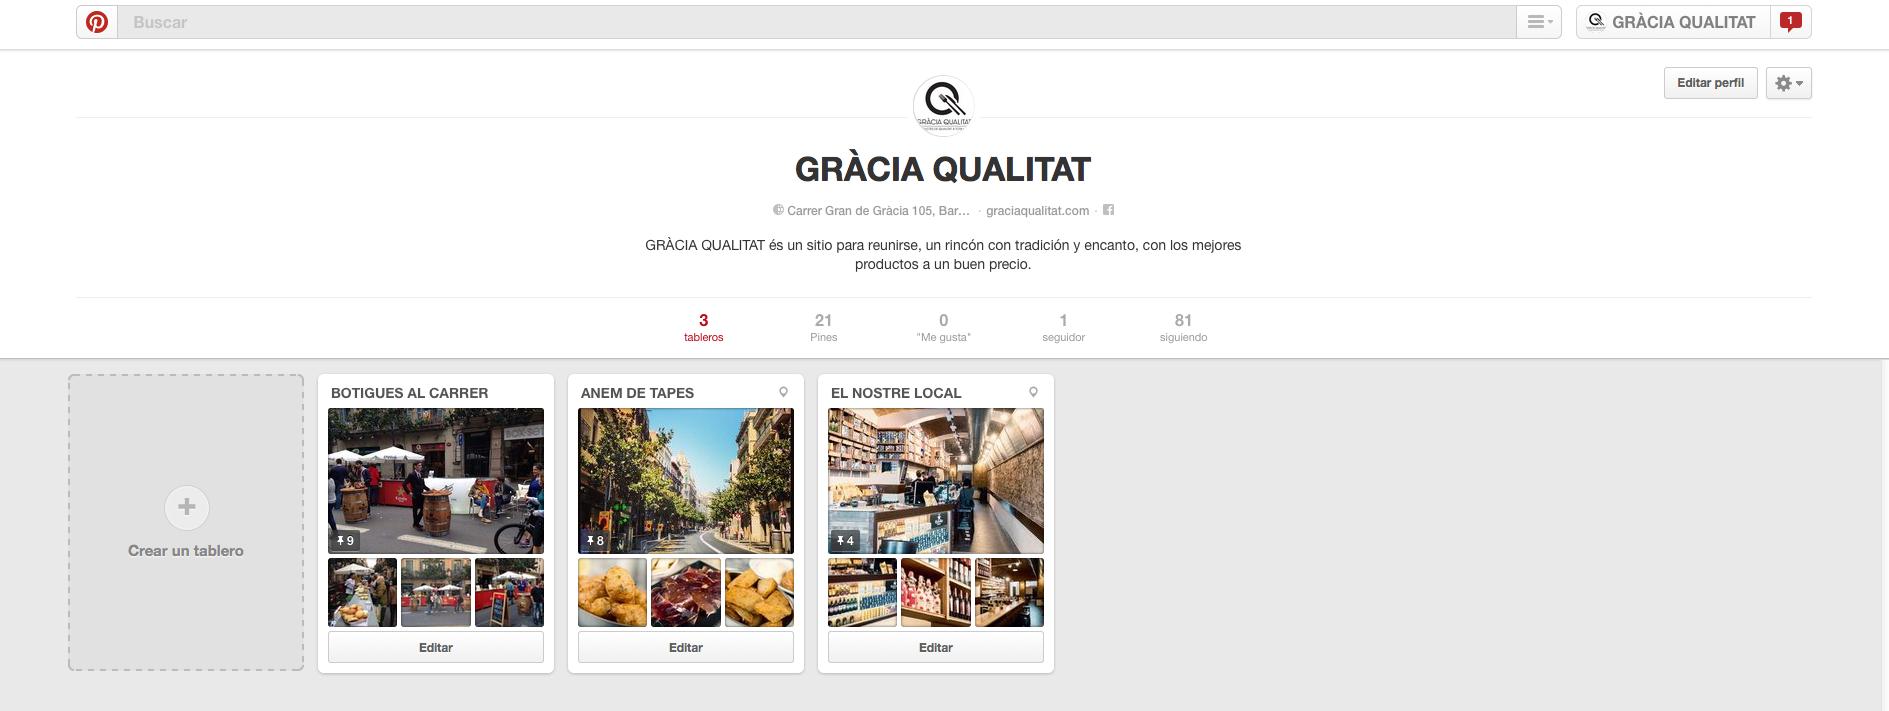 GRÀCIA QUALITAT - Pinterest